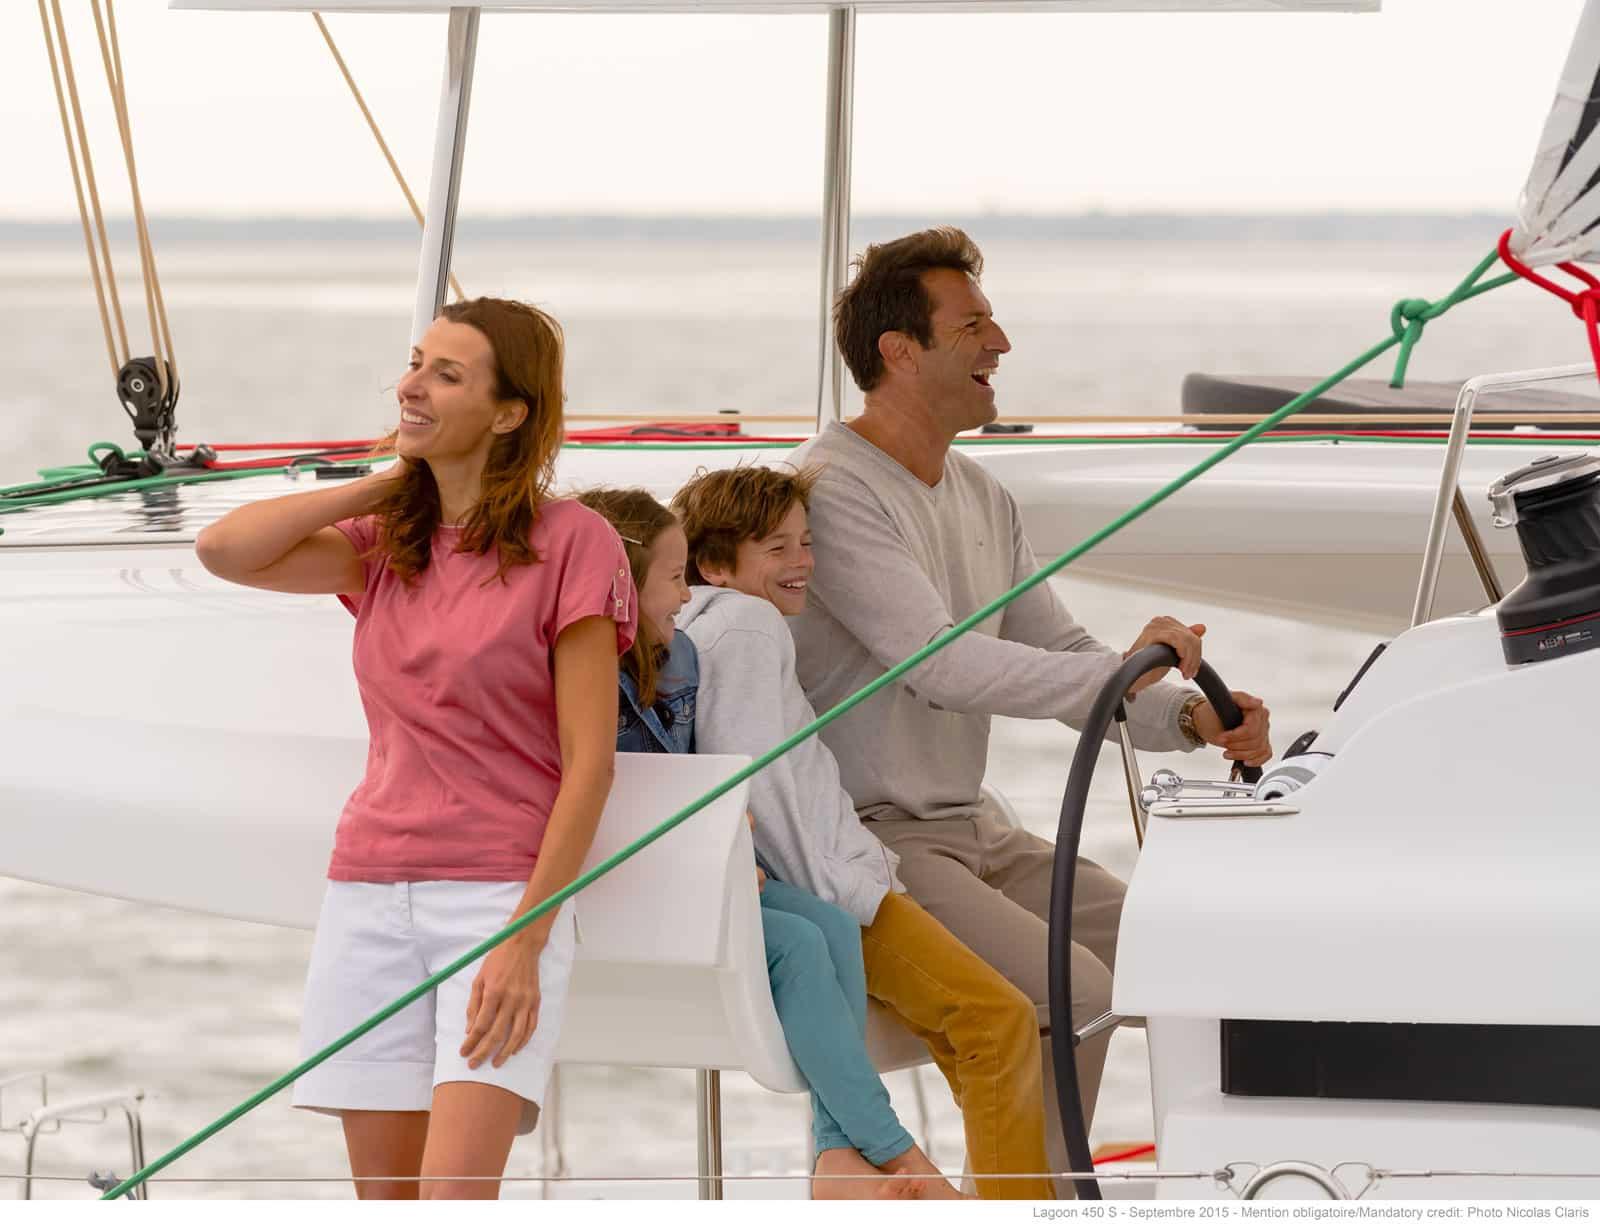 lagoon 450 S-yacht-charter-croatia-sailing-holidays-croatia-booking-yacht-charter-croatia-catamarans-sailboats-motorboats-gulets-luxury-yachts-boat-rental-croatia 14